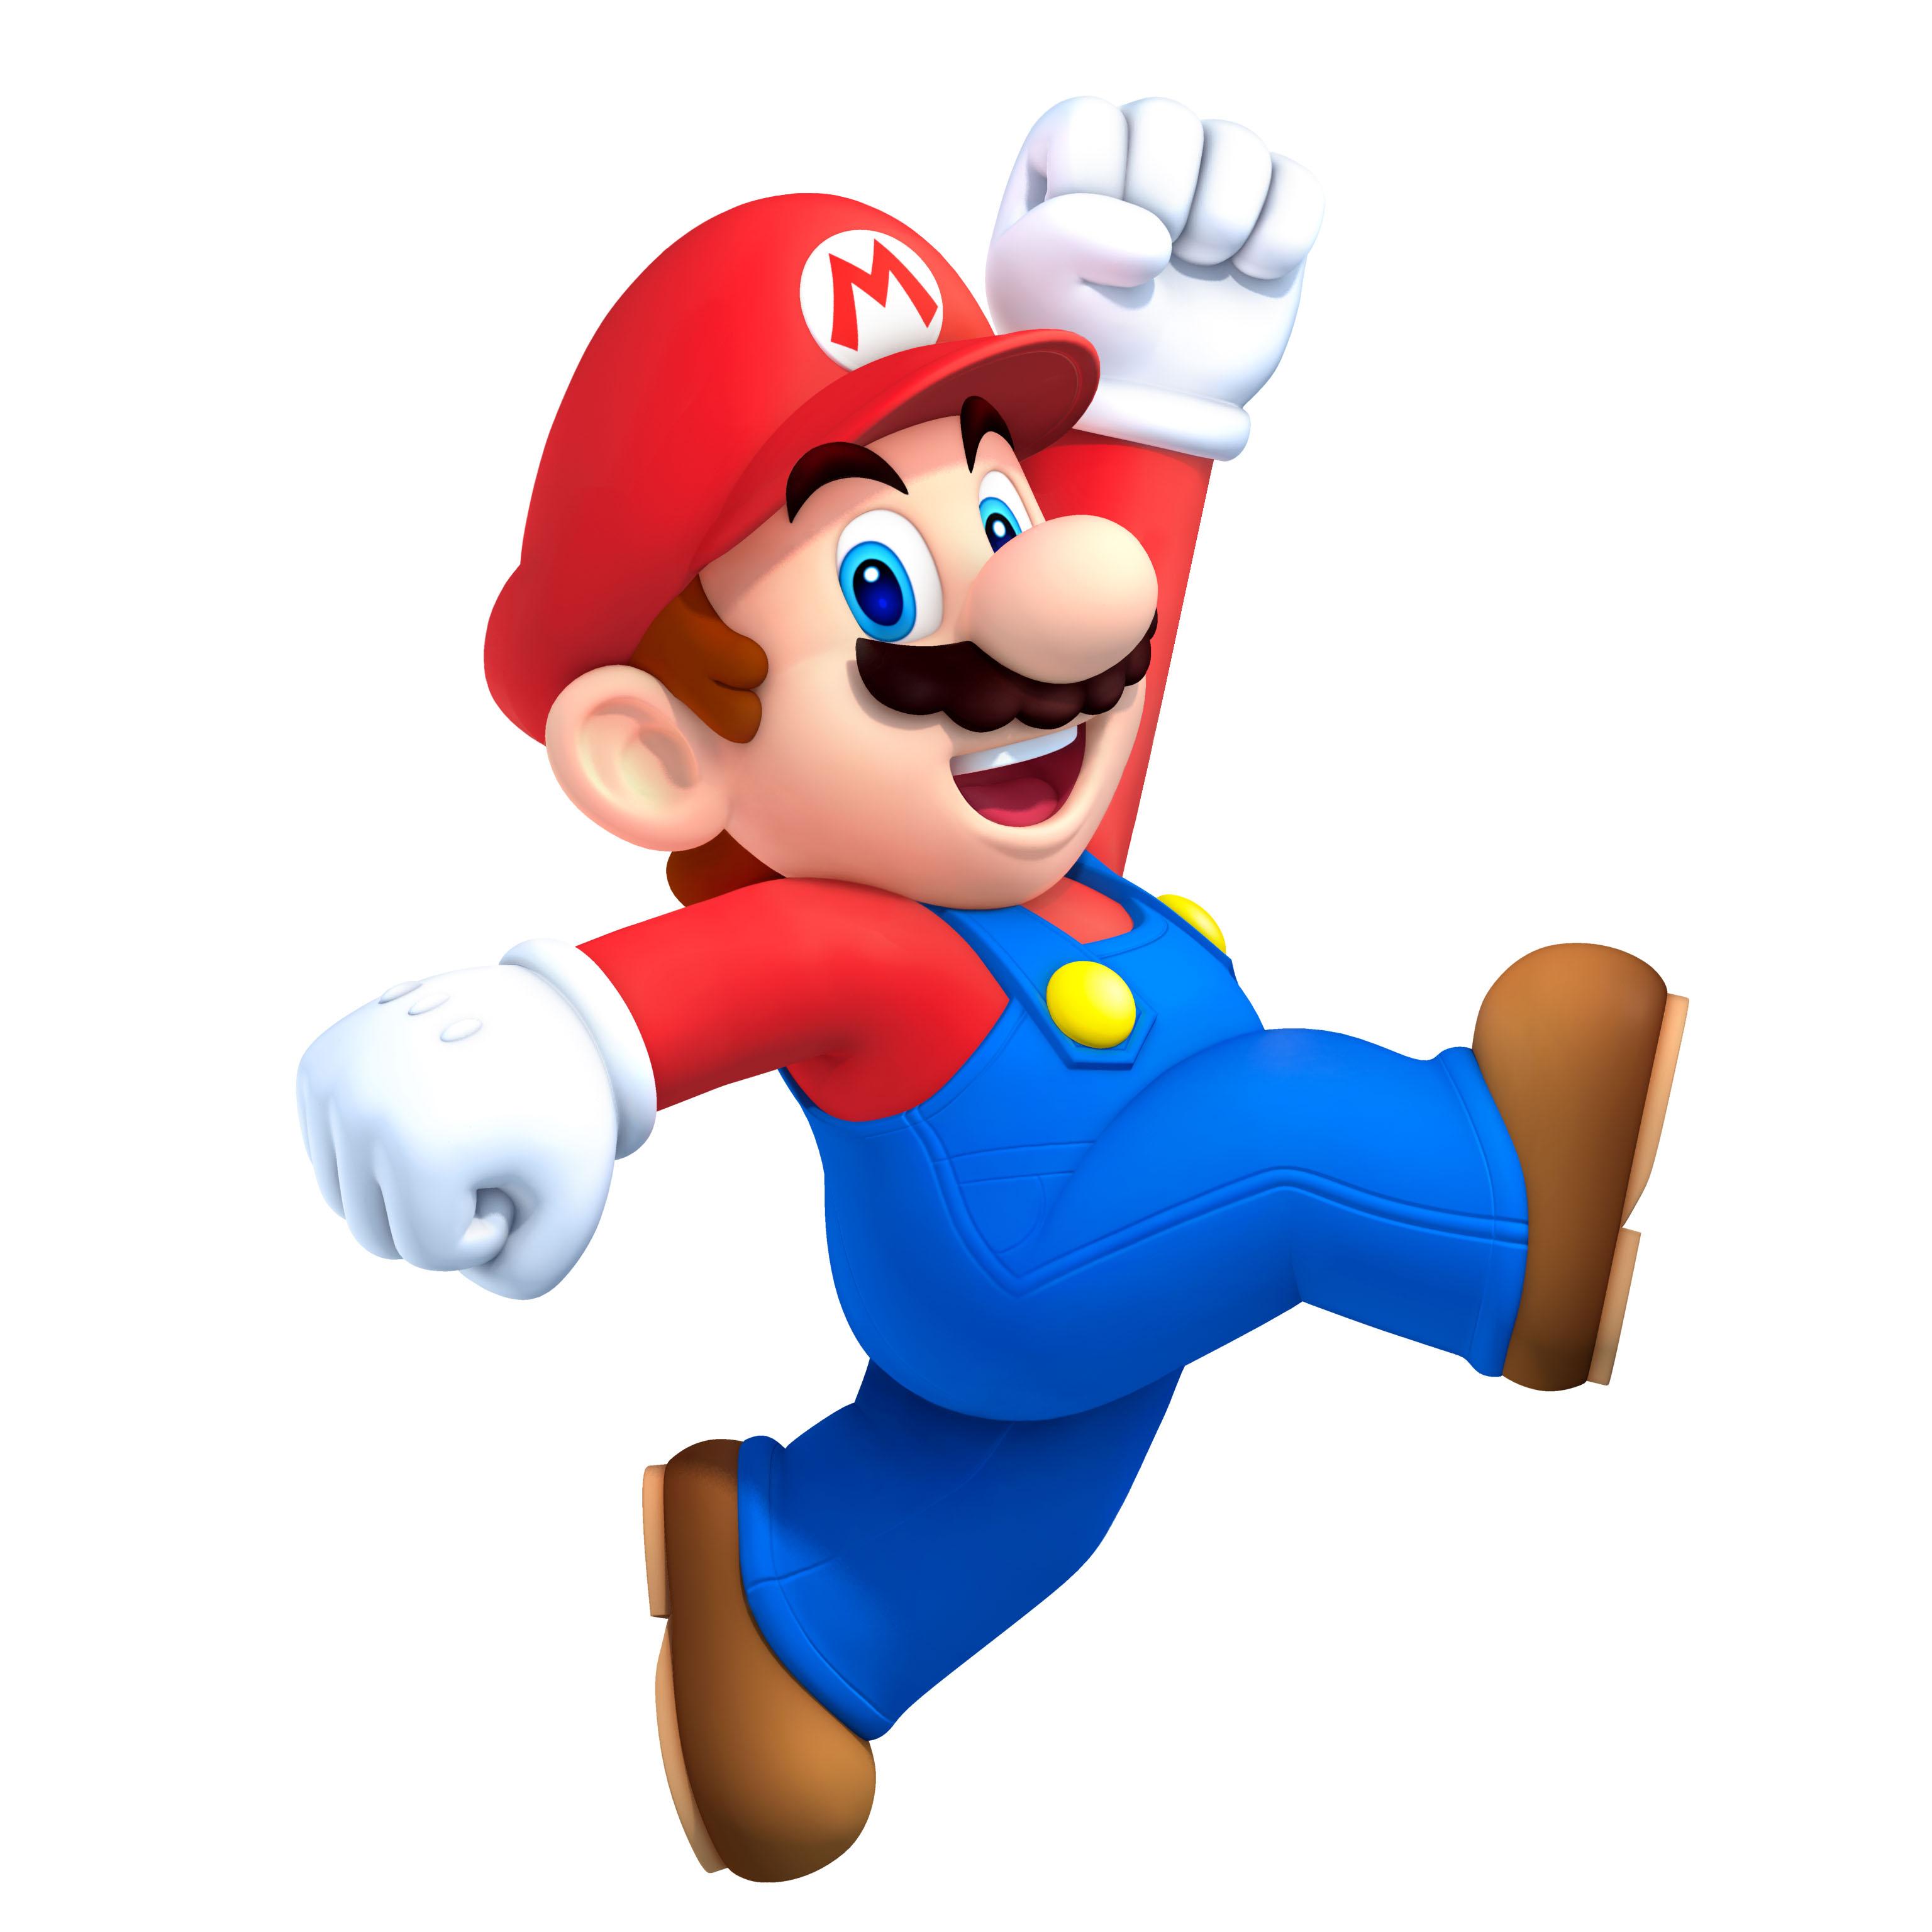 Mario clipart new super mario bro Download Free Art on Art